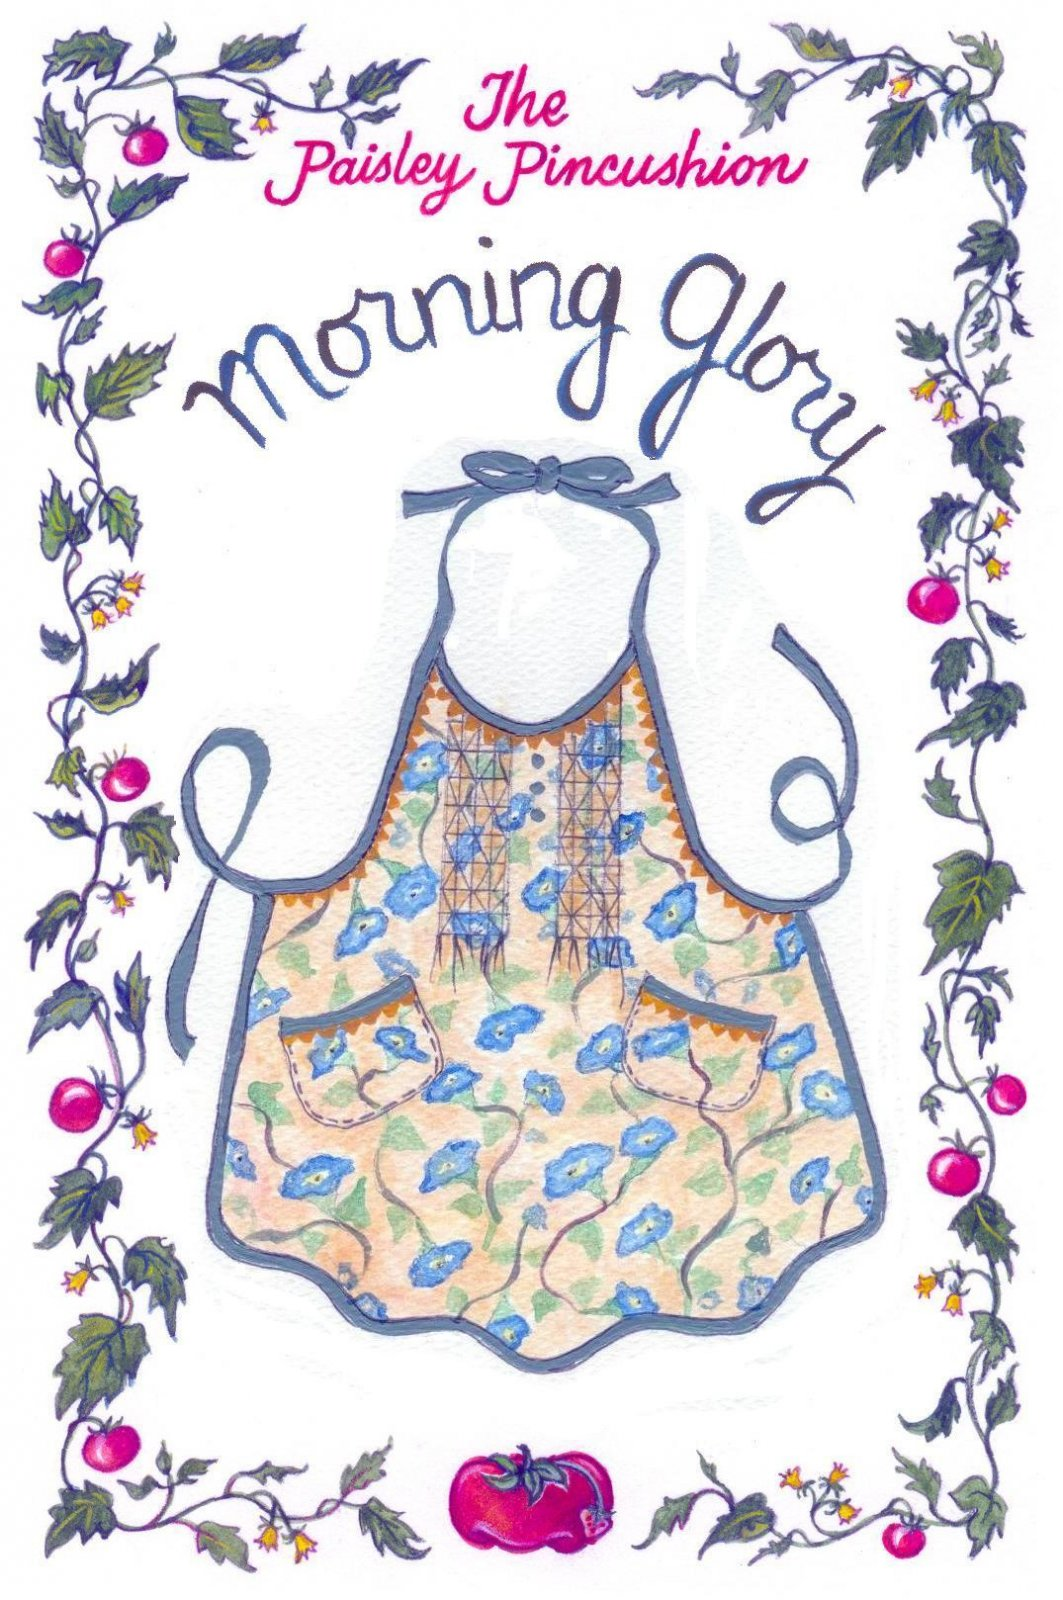 Morning Glory Apron